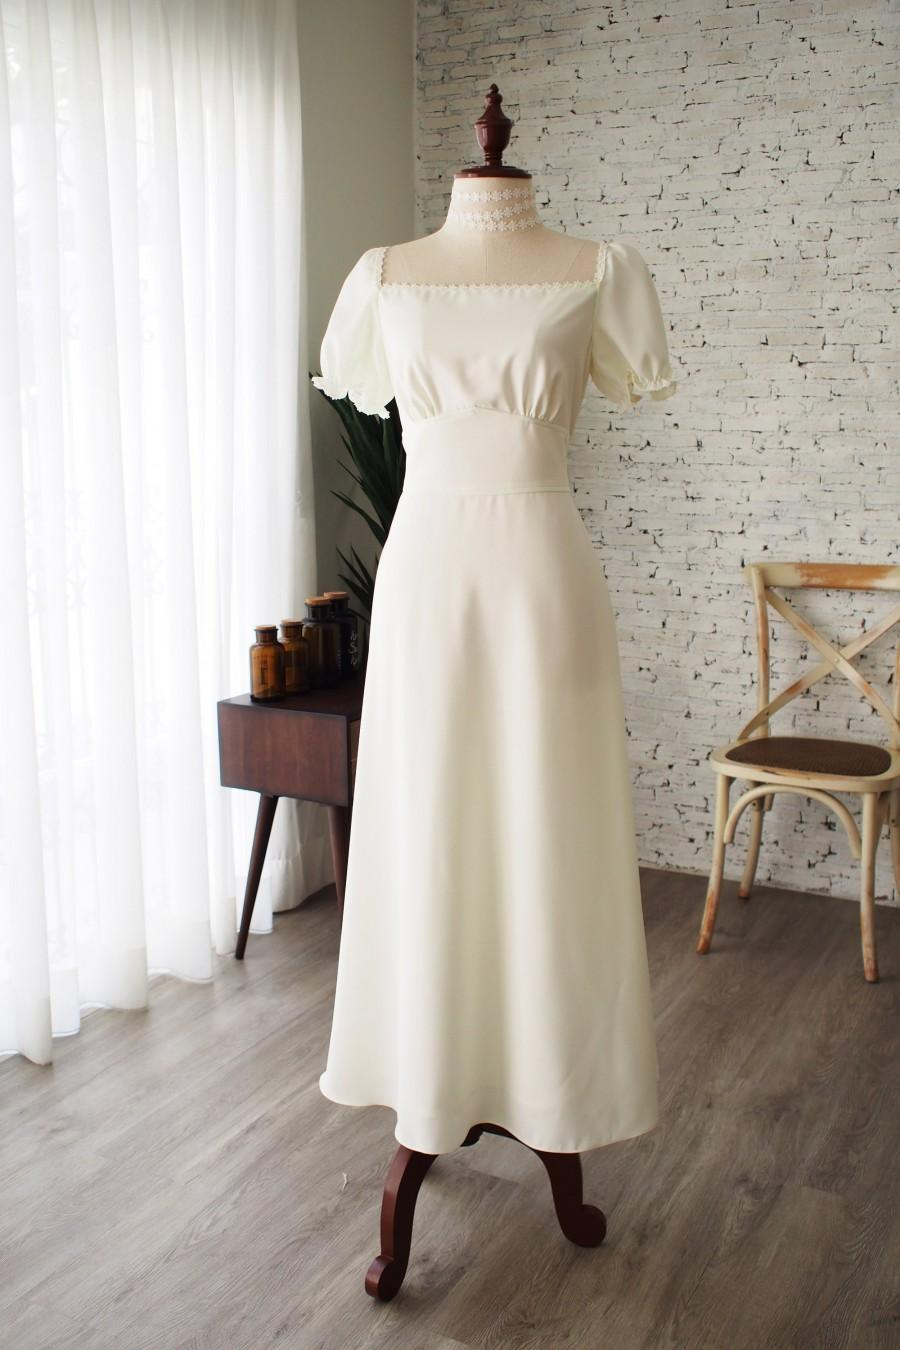 Rustic Wedding Dress Off White Prom Dress Snow White Puff